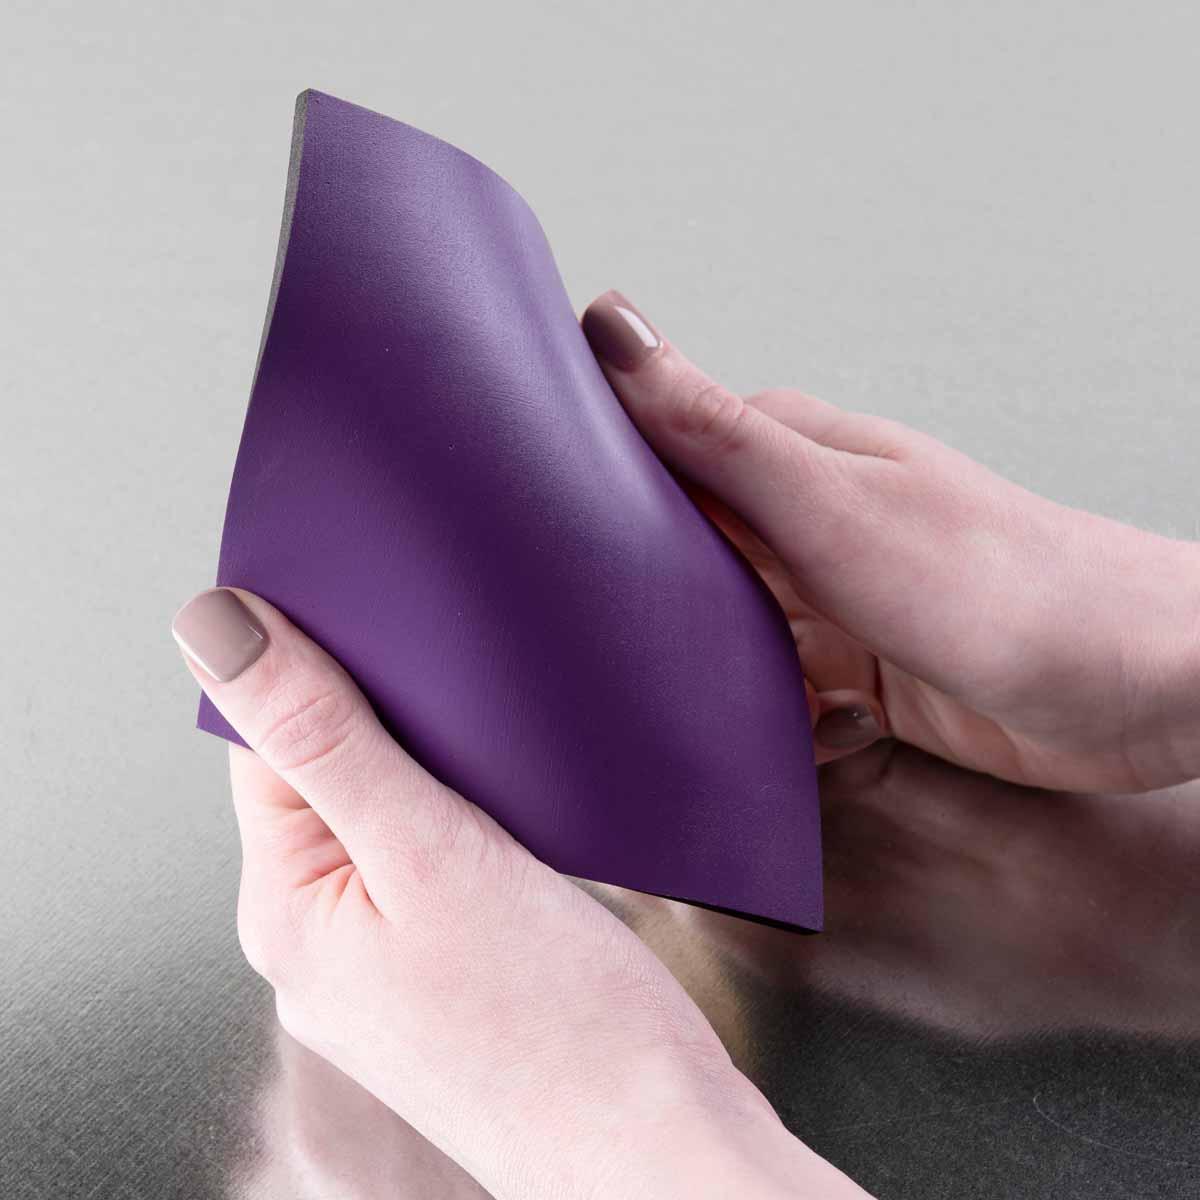 PlaidFX Smooth Satin Flexible Acrylic Paint - Bloodline, 3 oz. - 36842